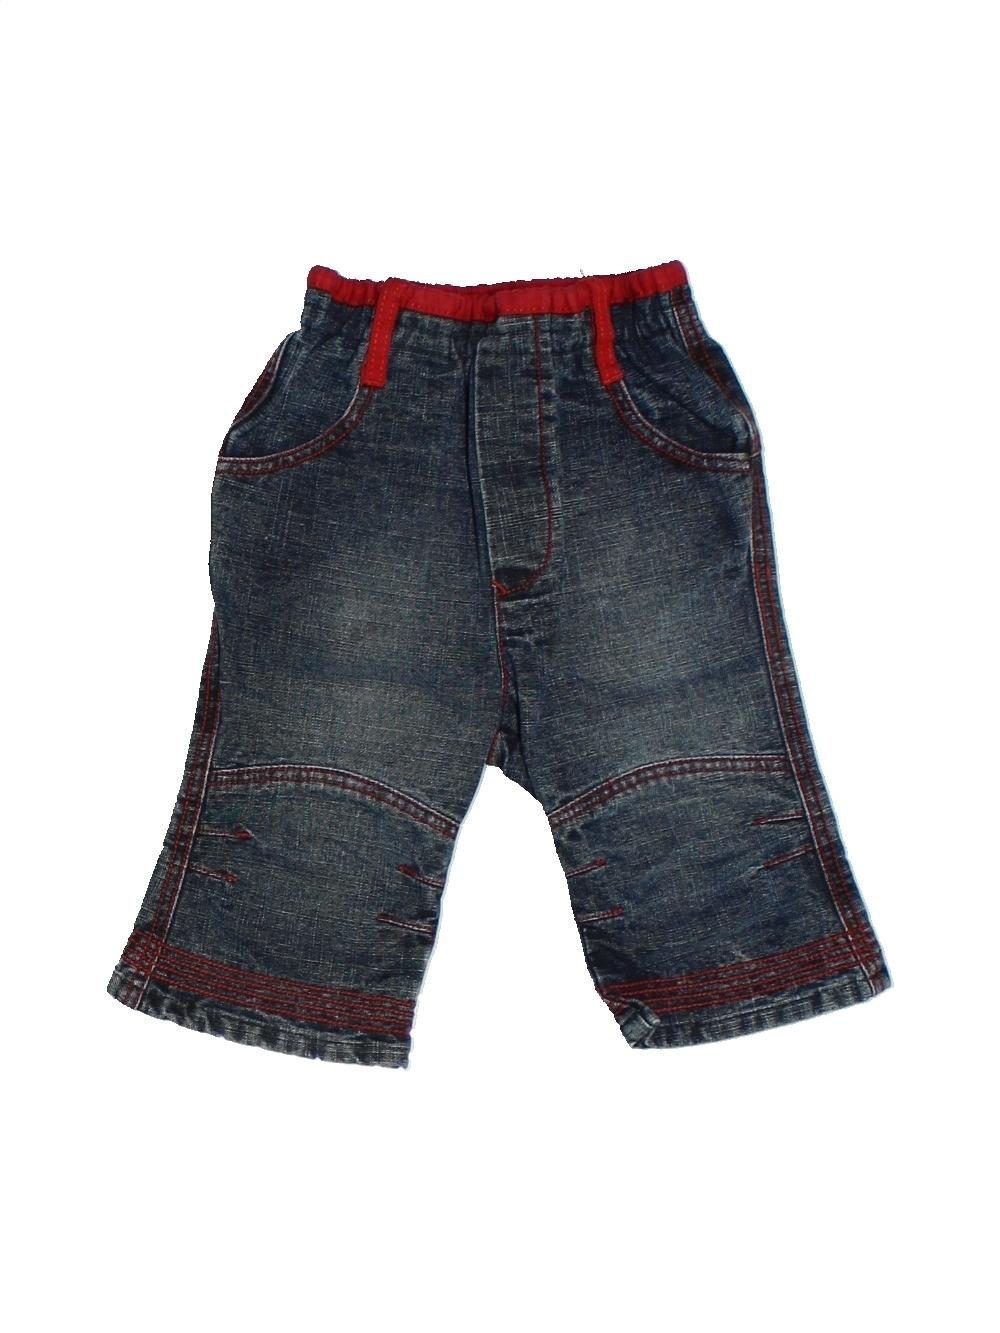 Pantalon-bebe-garcon-CATIMINI-3-mois-bleu-hiver-vetement-bebe-1099316